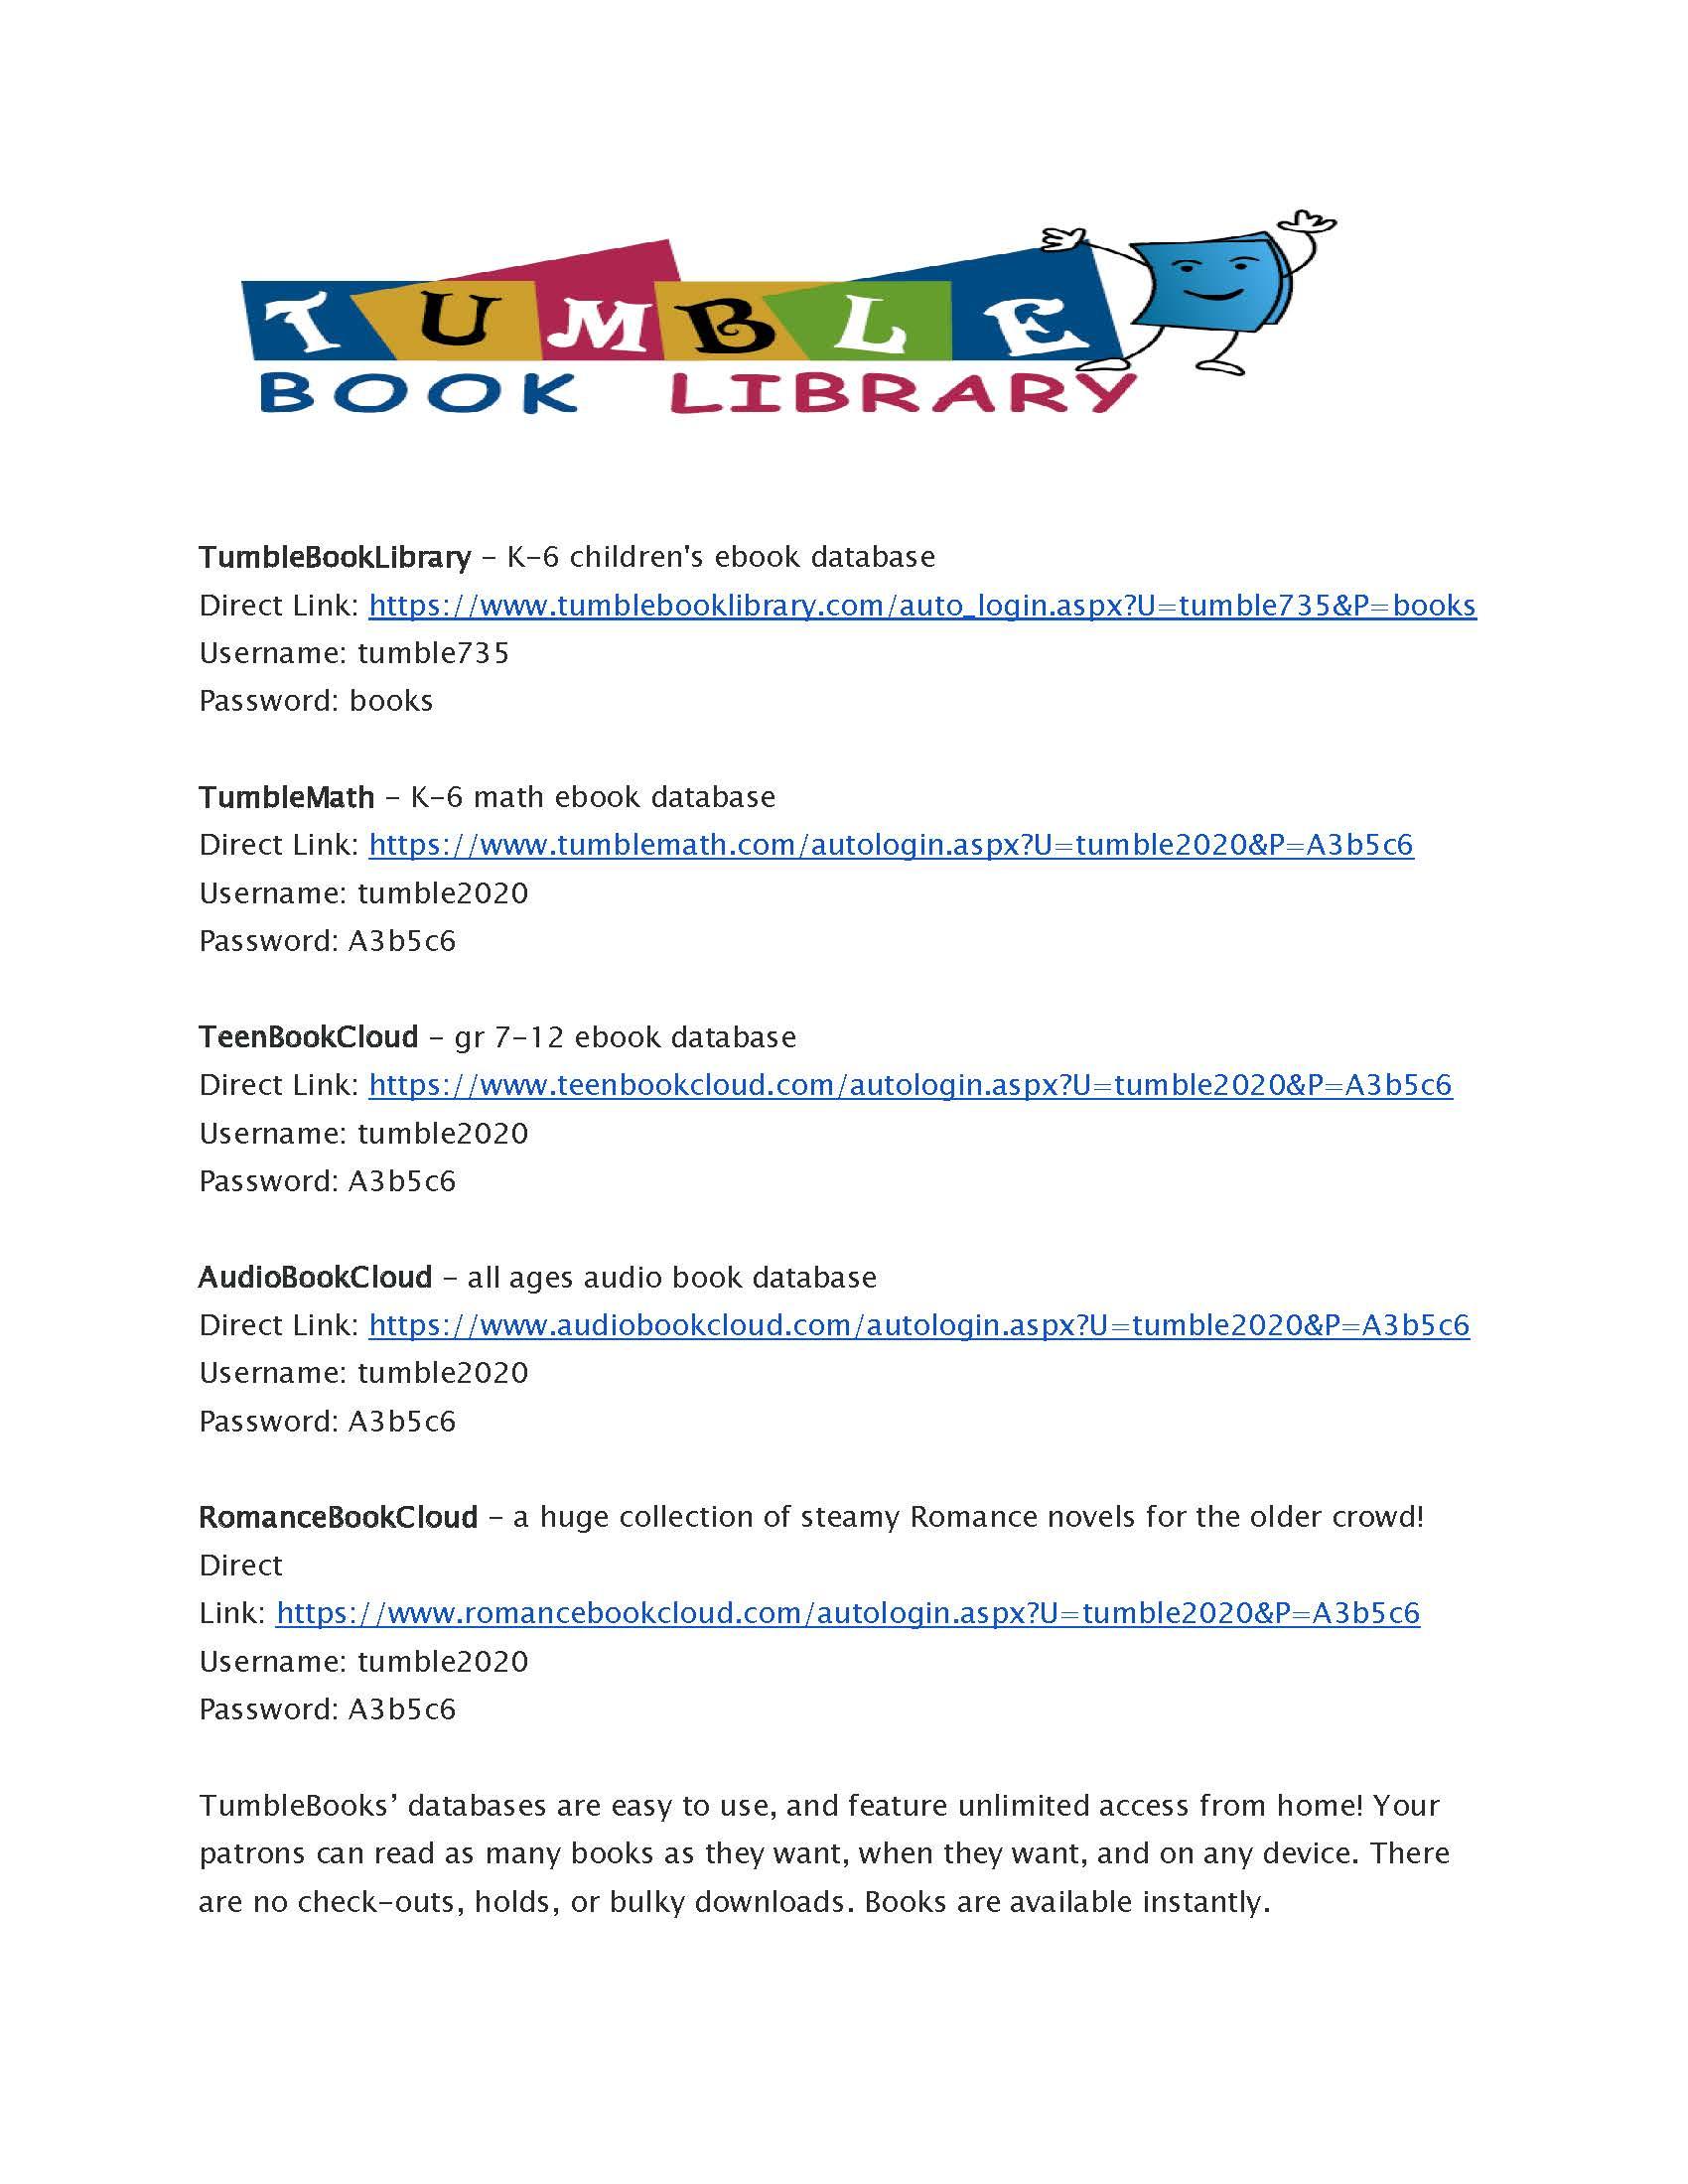 TumbleBookLibrary.jpg